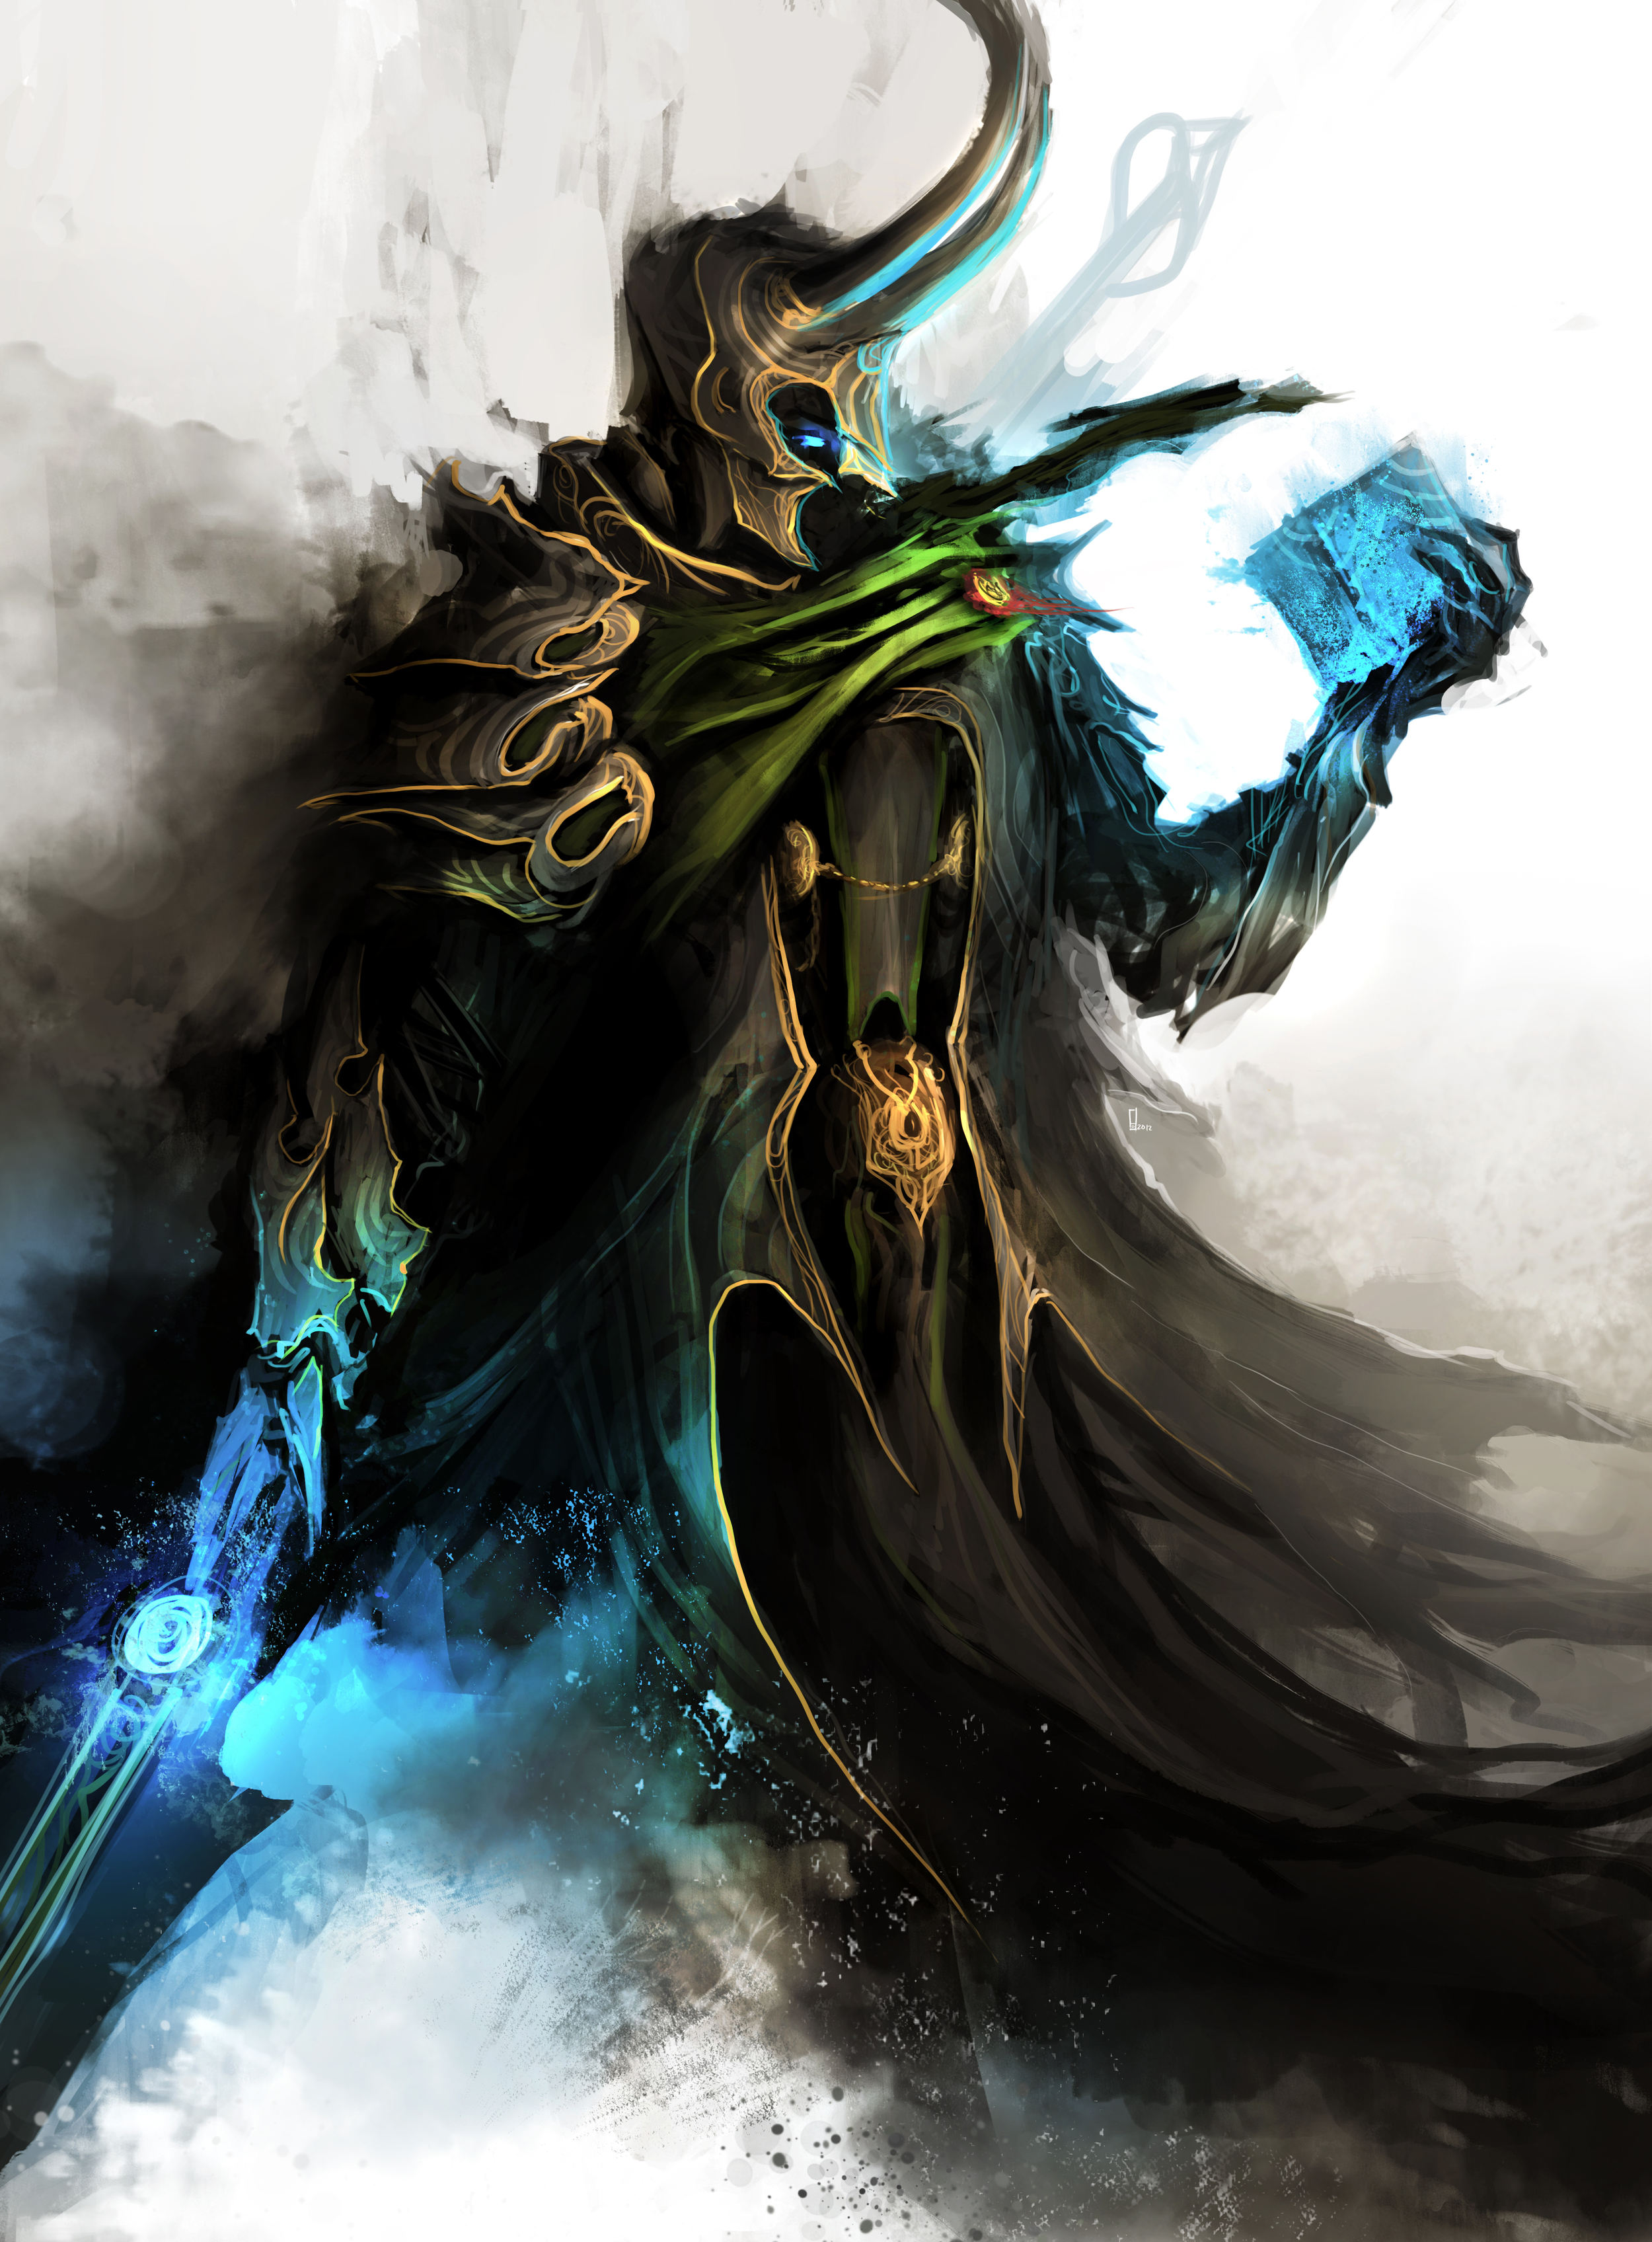 the_avengers___loki_by_thedurrrrian-d52yvub.jpg